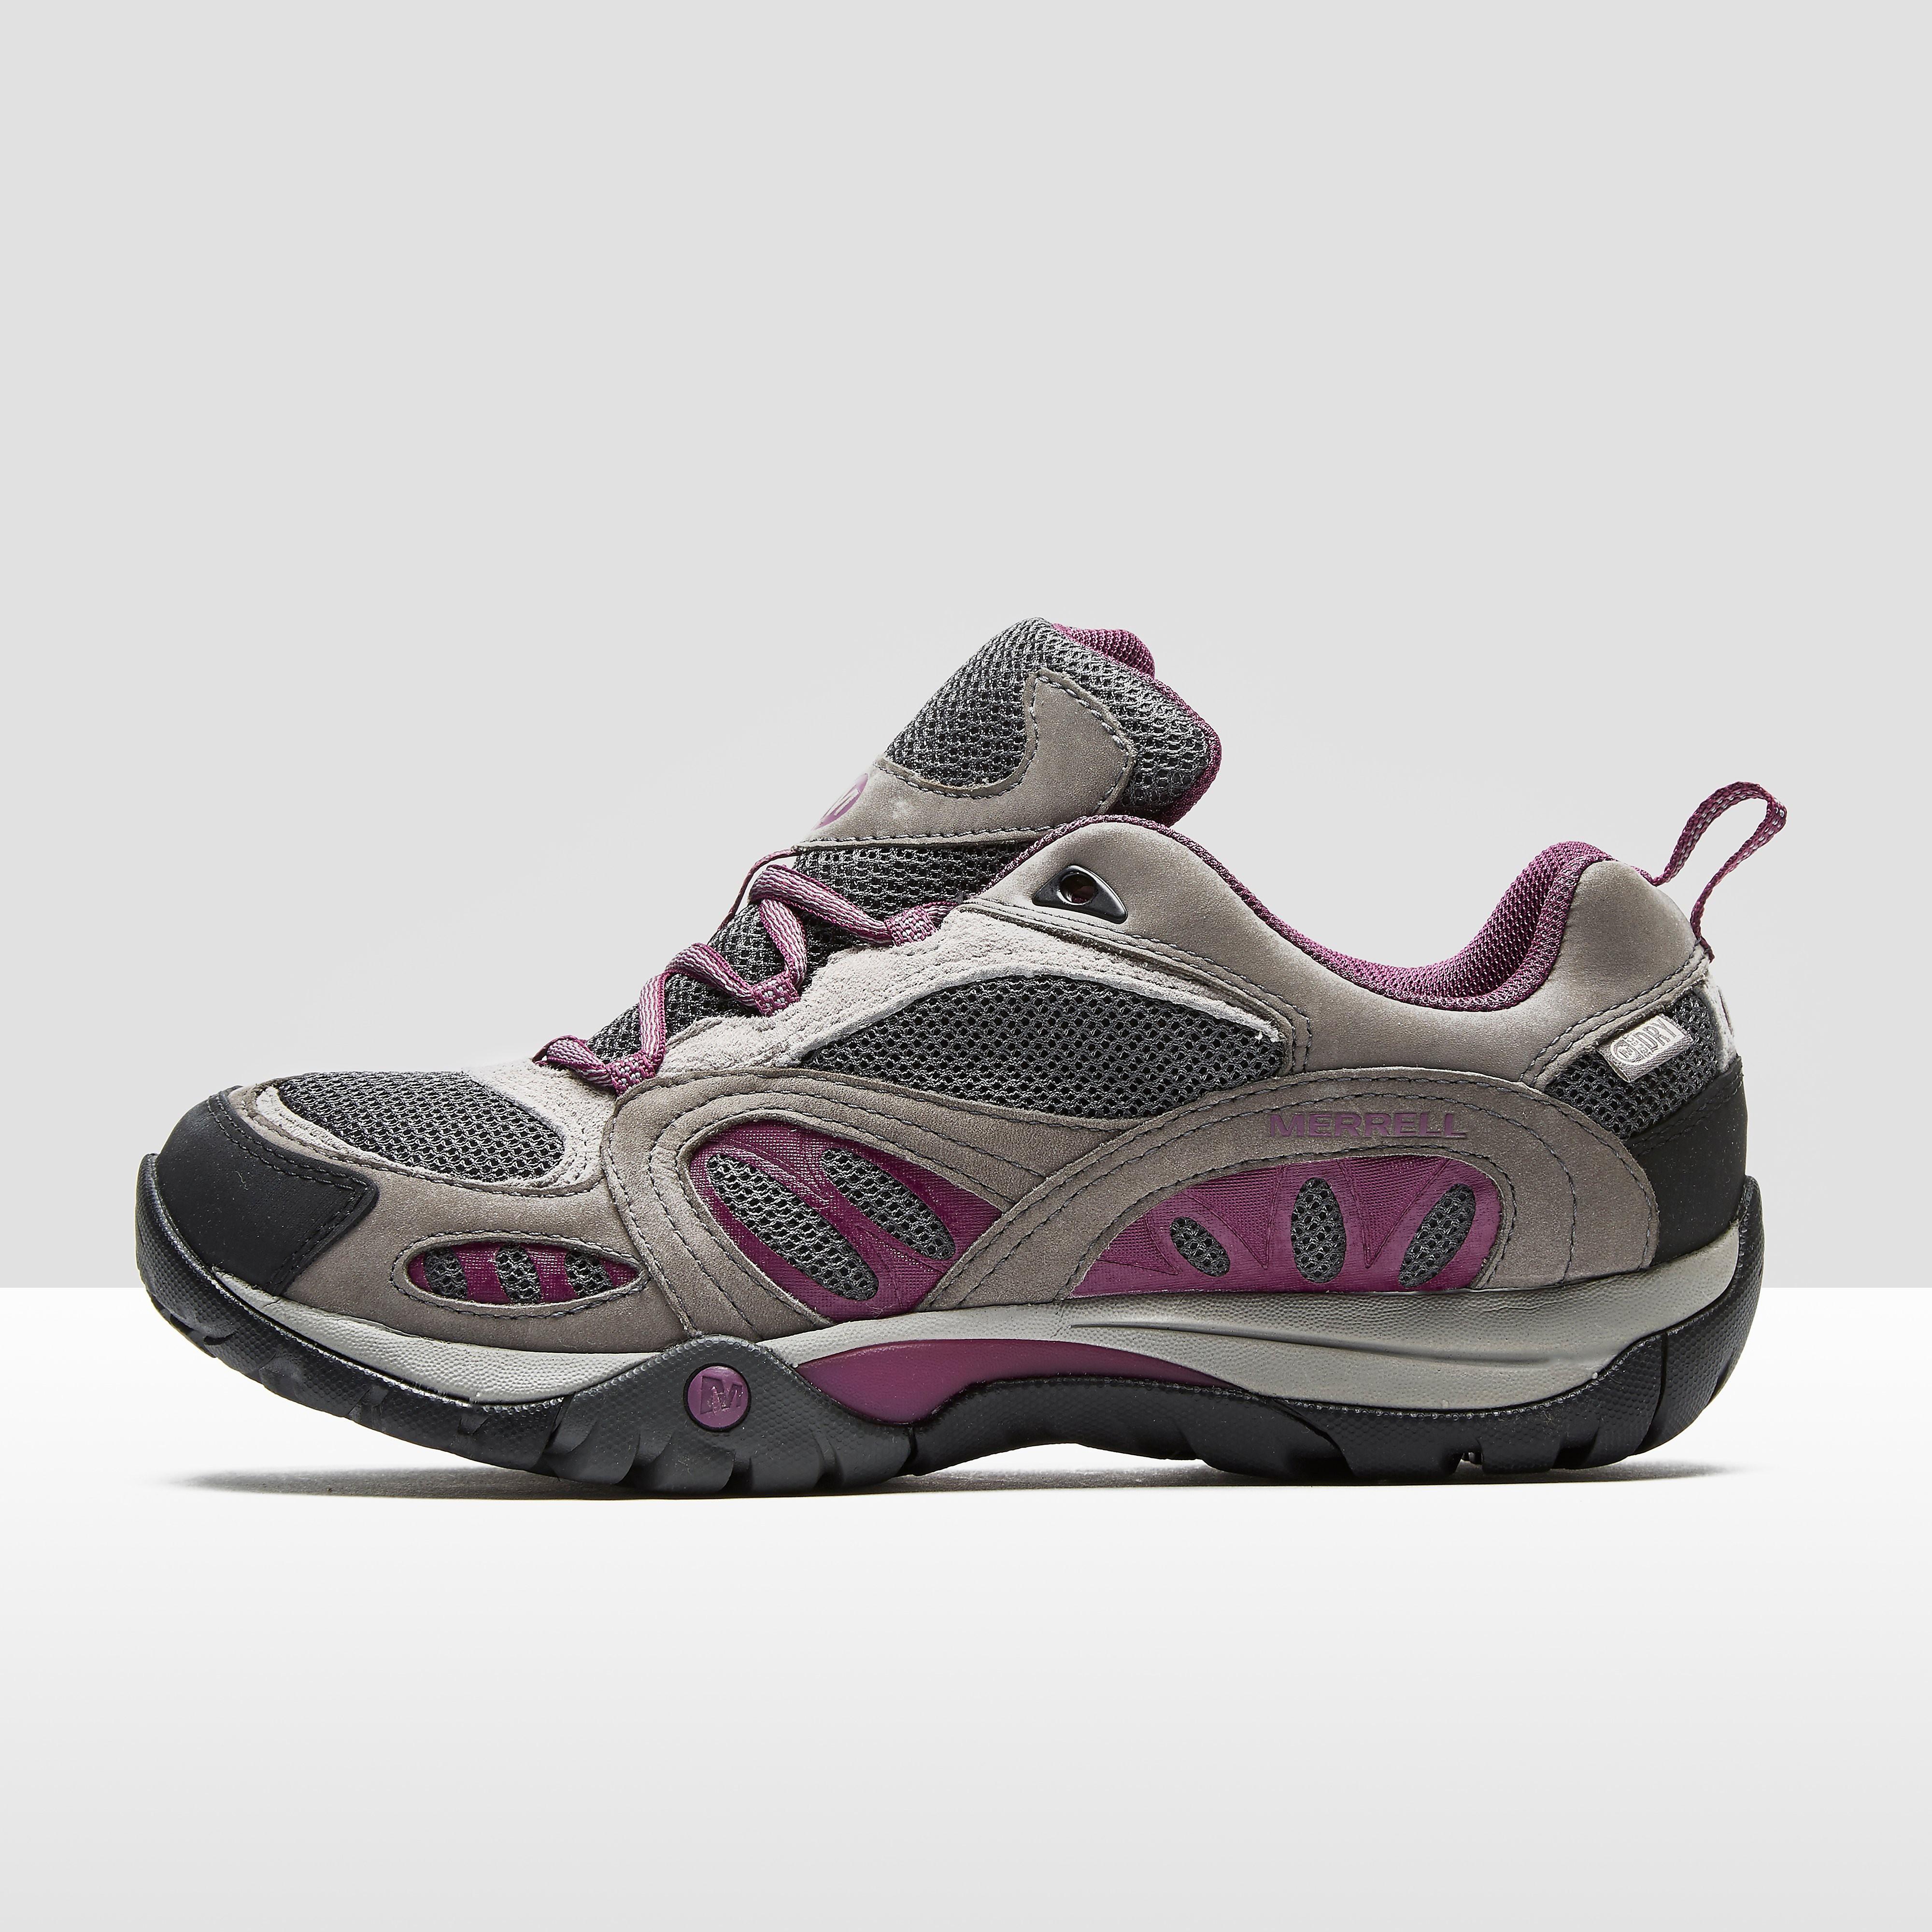 Merrell Azura Low Waterproof Hiking Shoe Women's